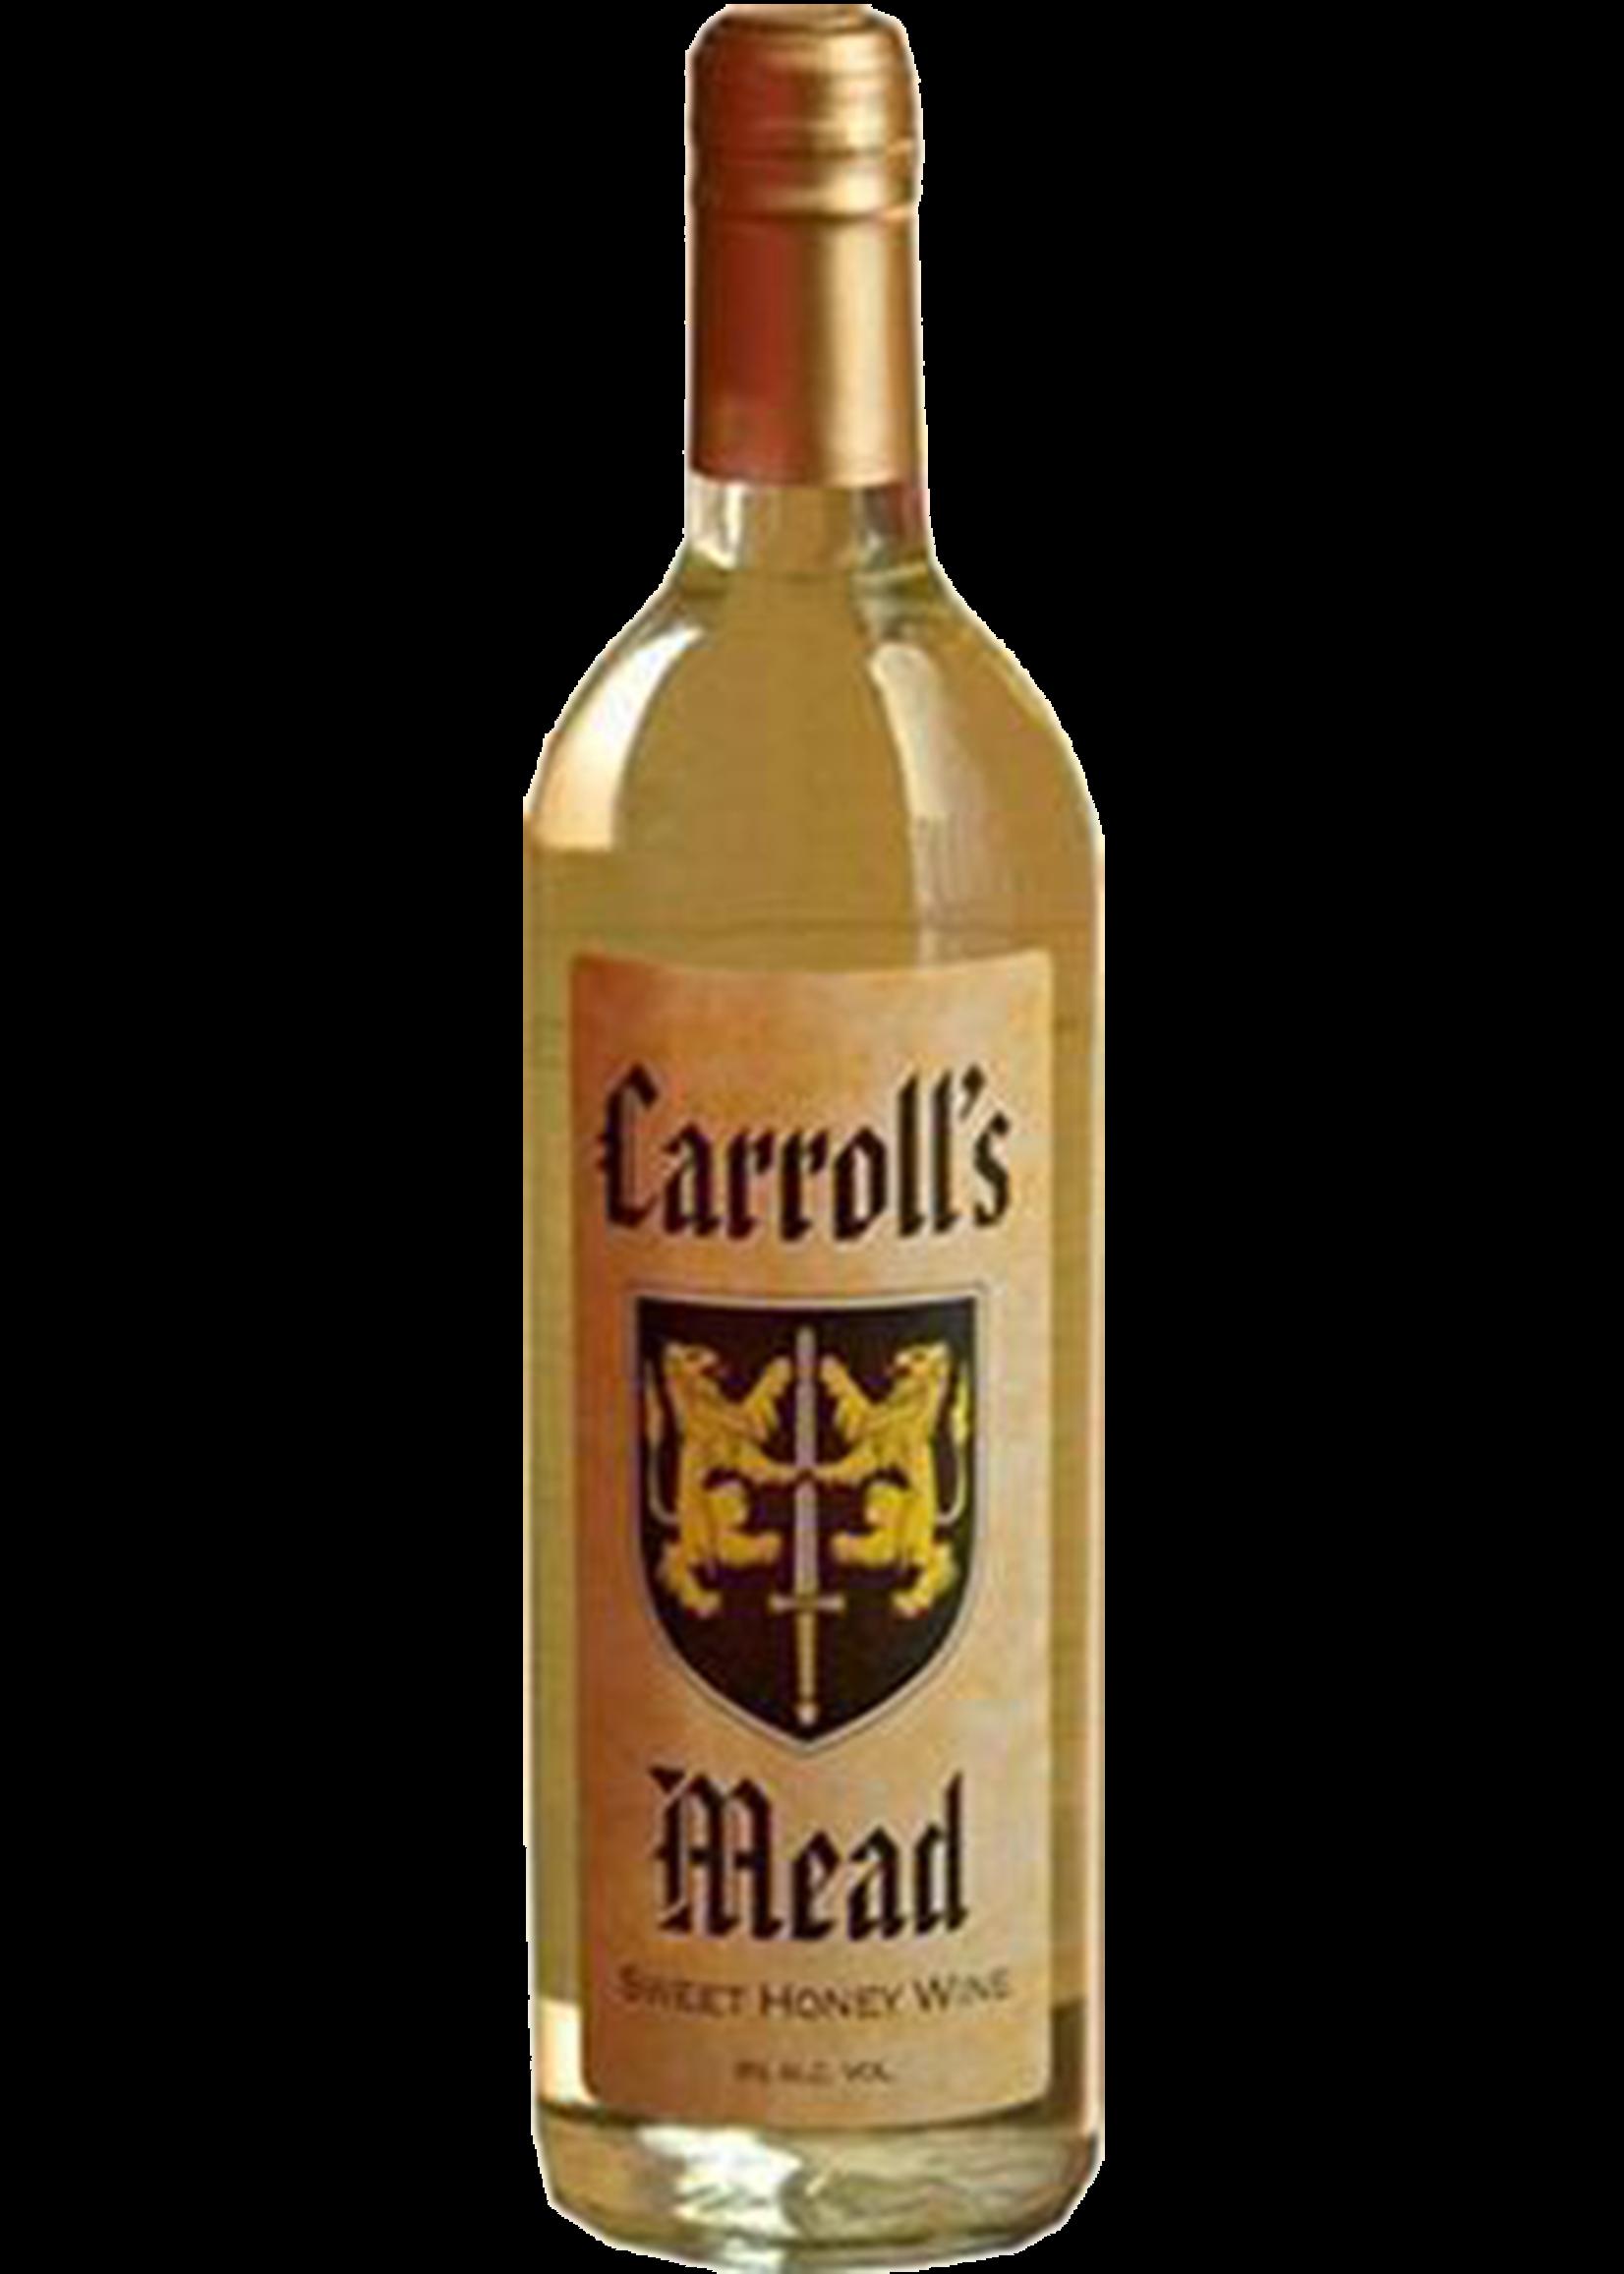 Brotherhood Carroll's Mead / Sweet Honey Wine / 750mL